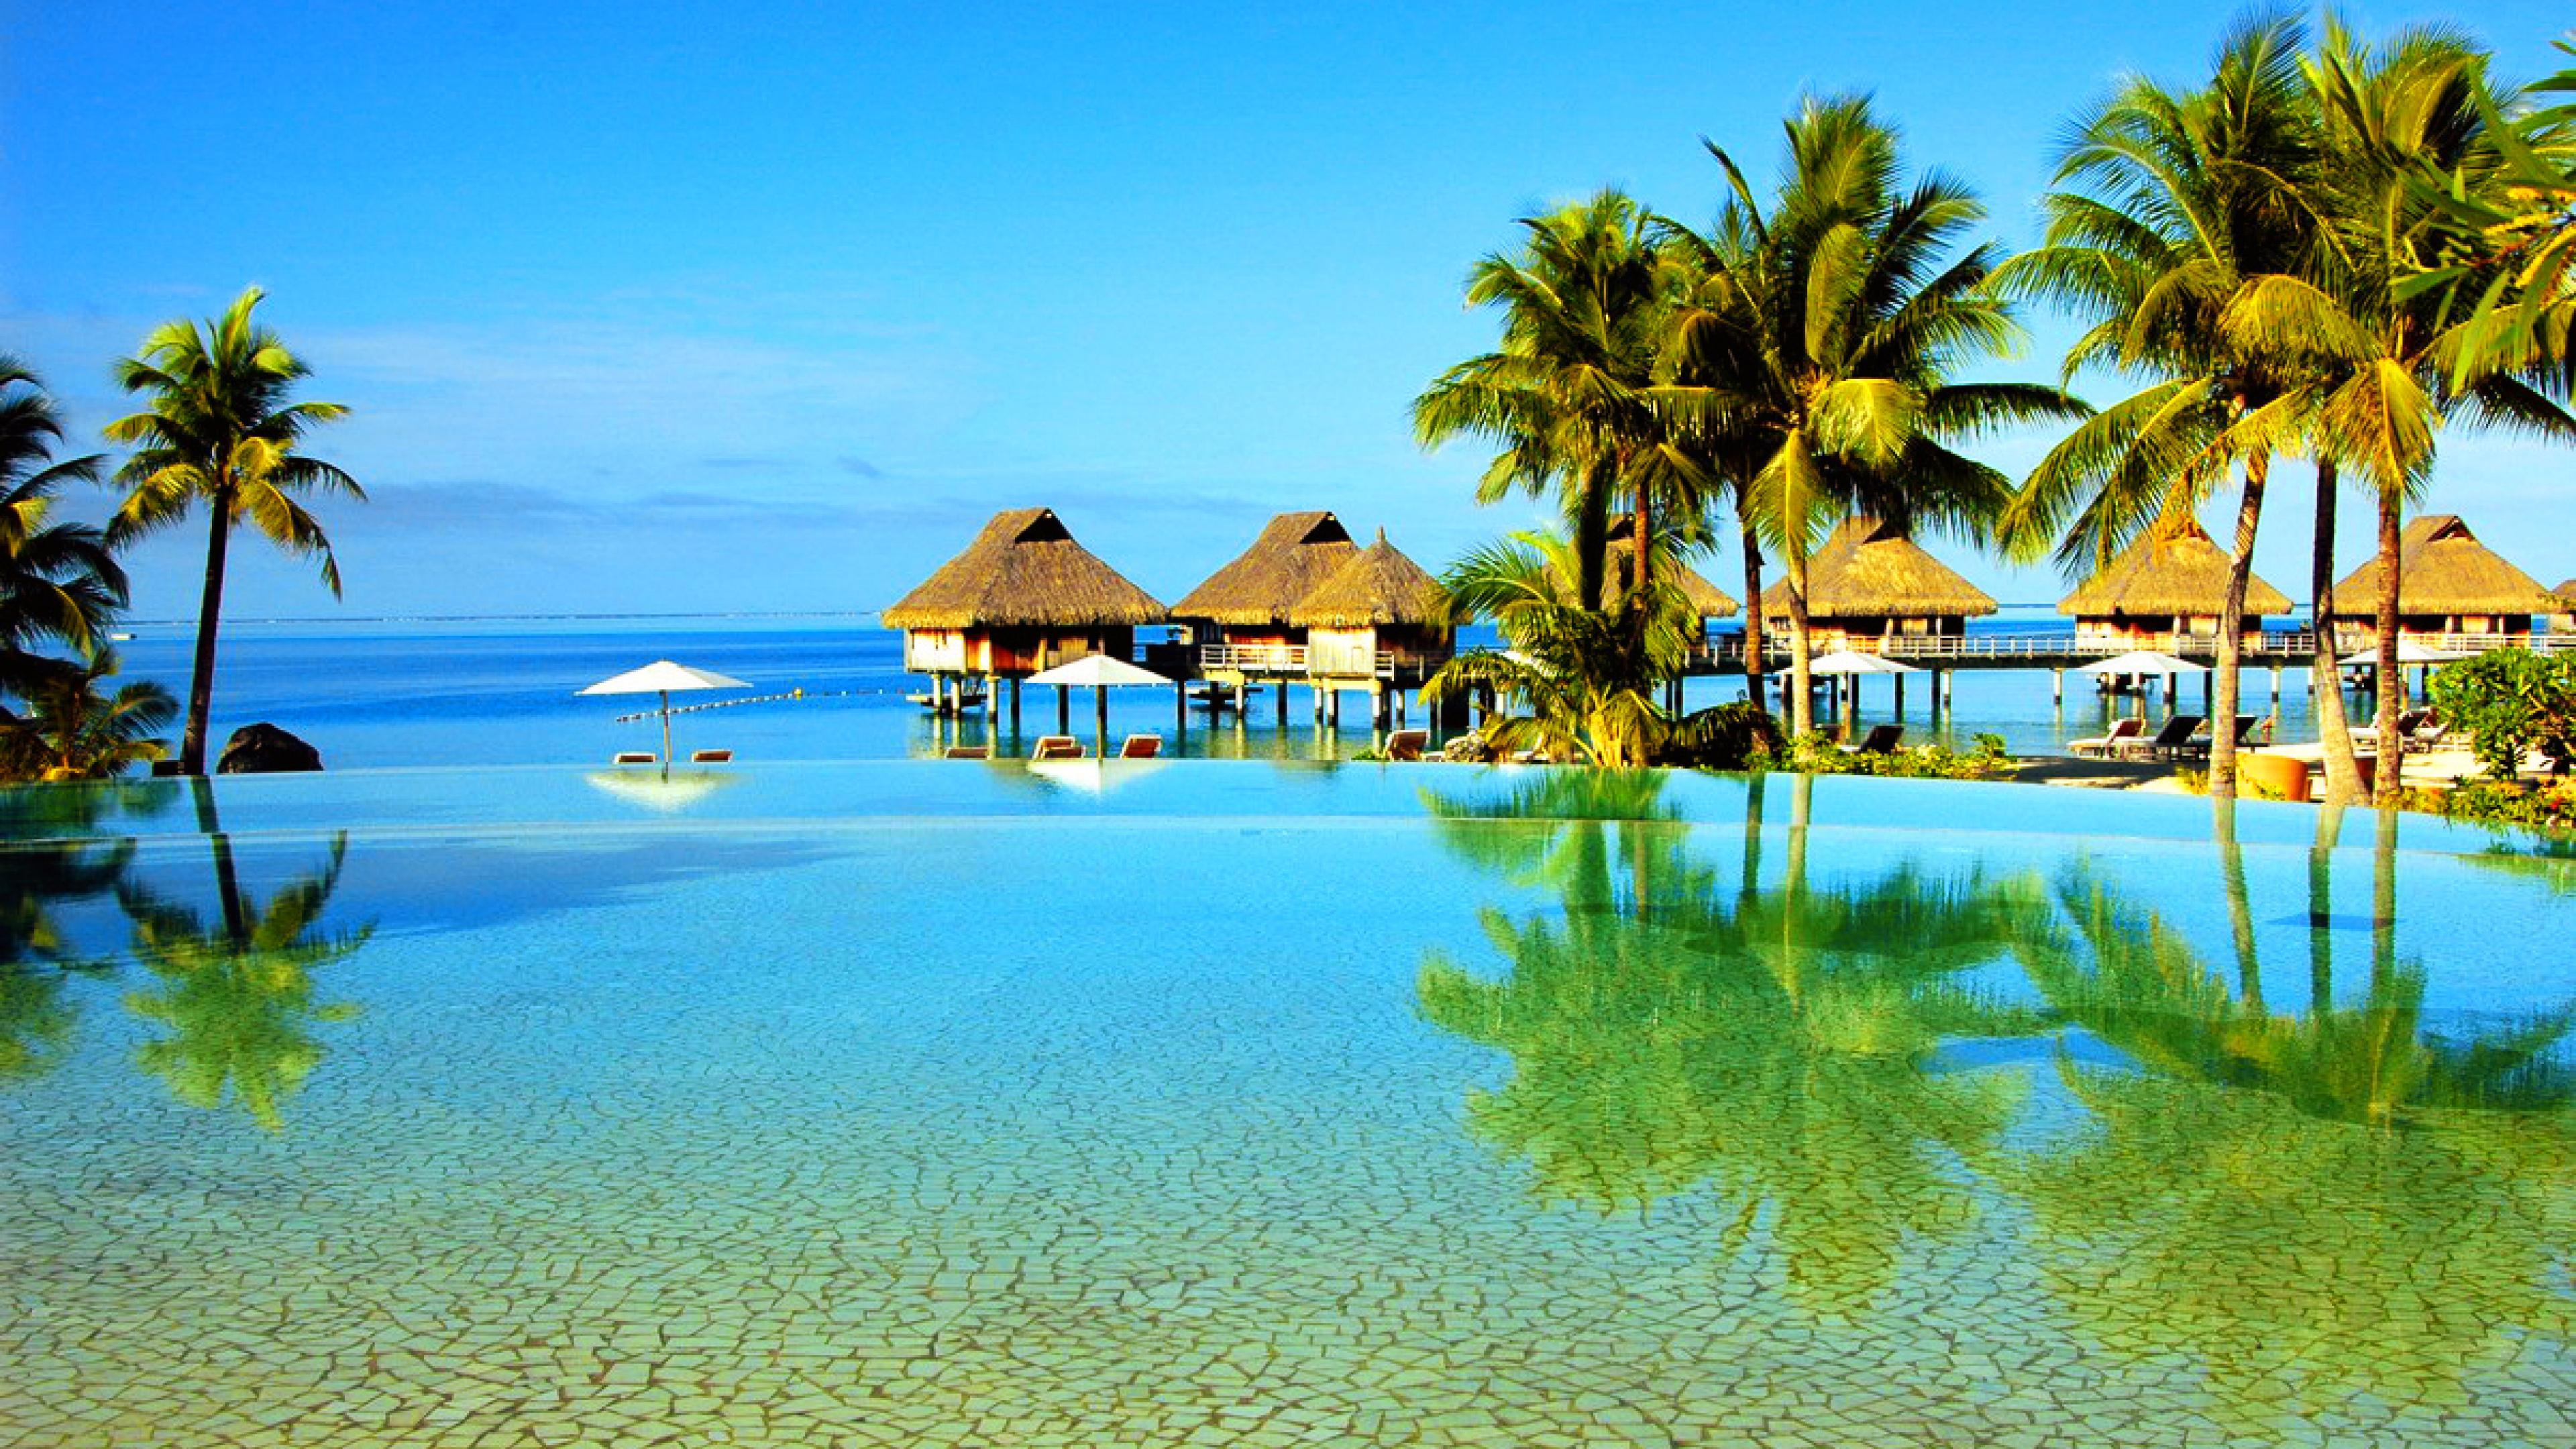 Exotic Beach Wallpaper Top 48 Exotic Beach Wallpapers 3840x2160